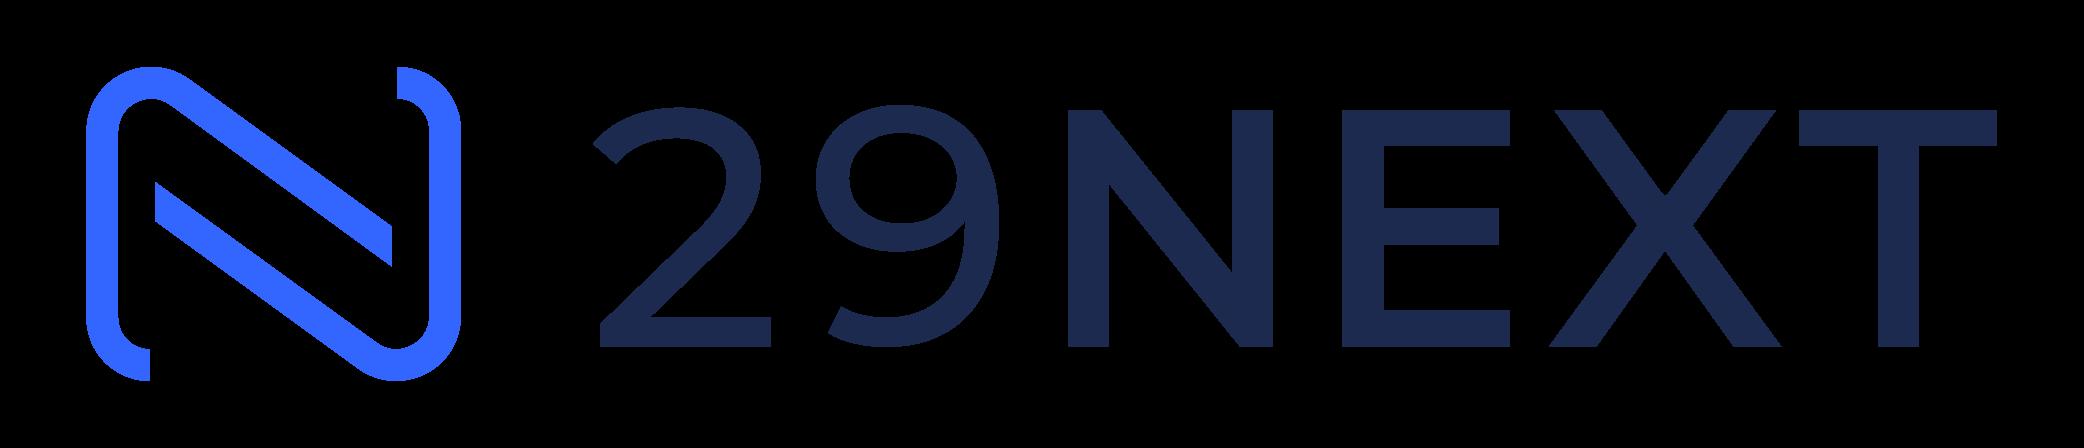 29next-logo-master